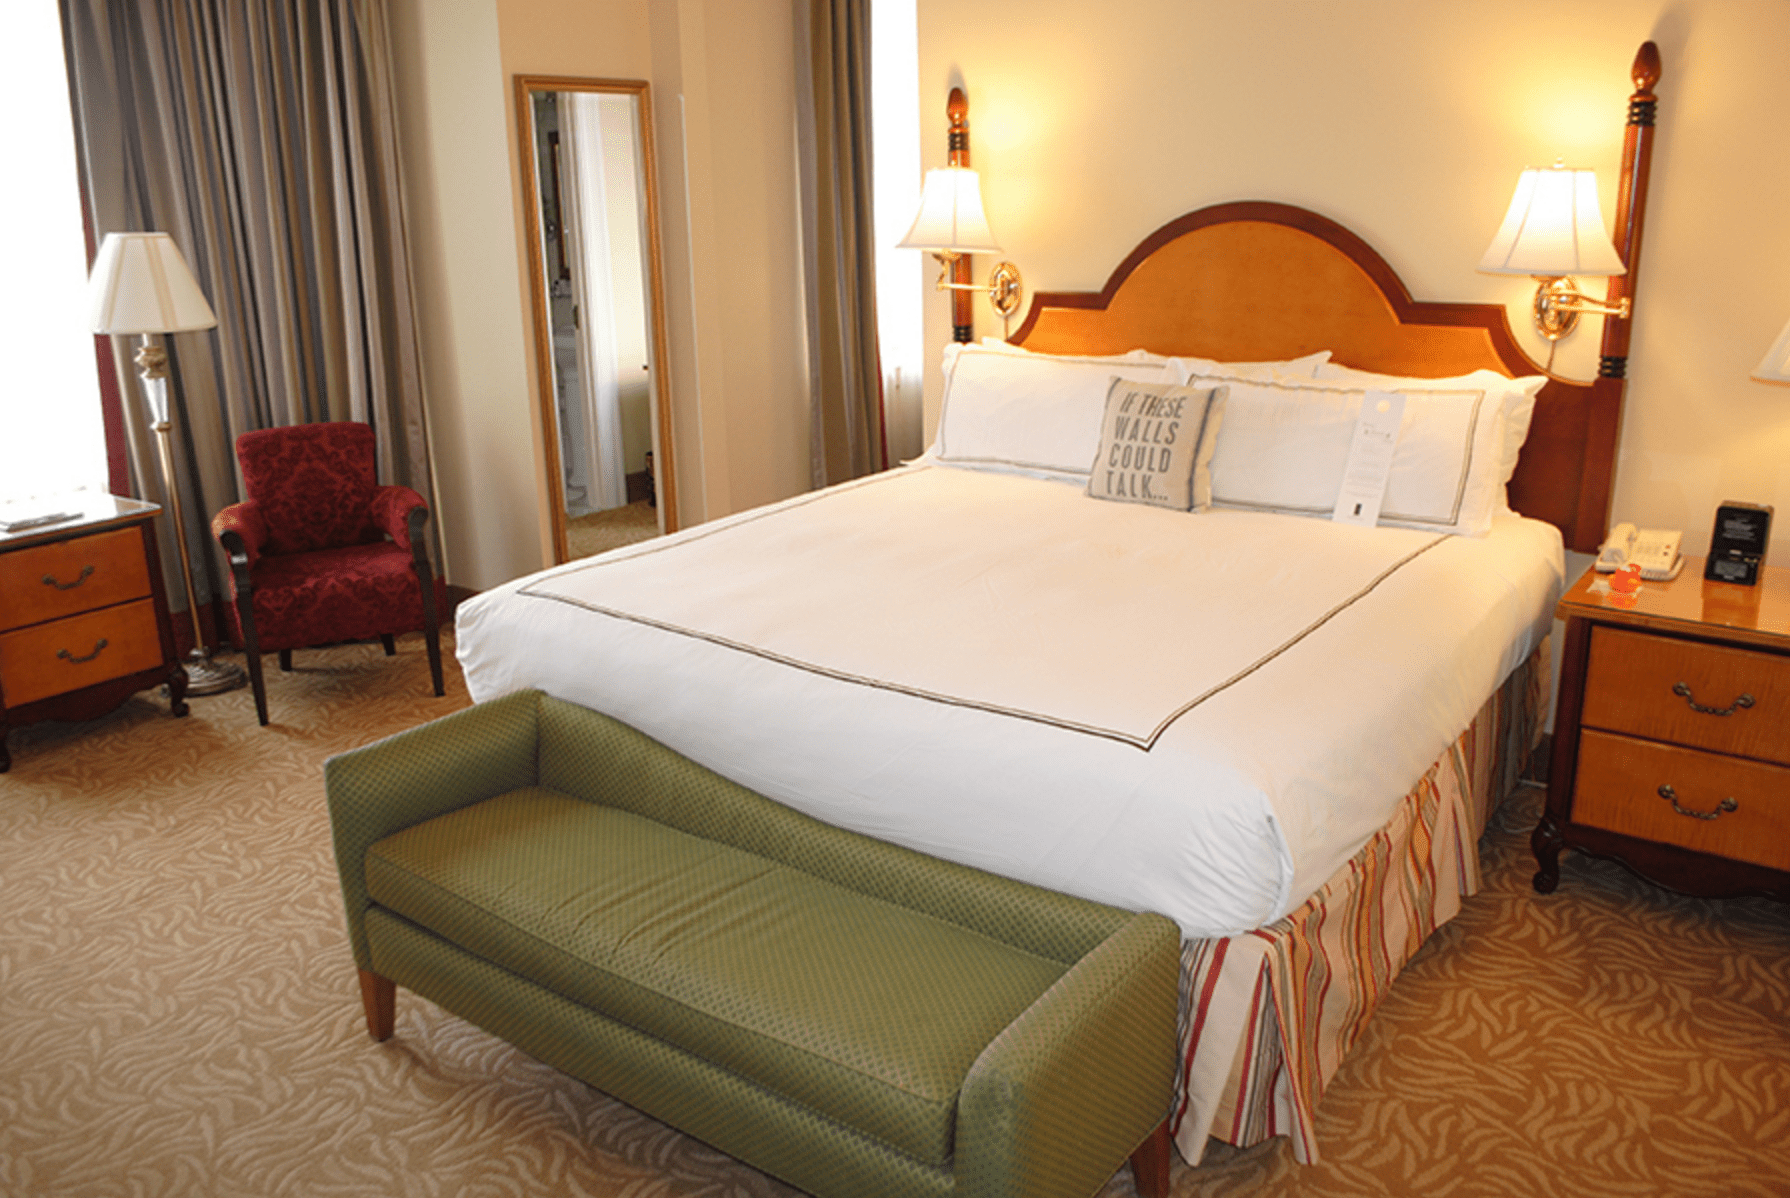 Romantic Hotels In Providence Rhode Island